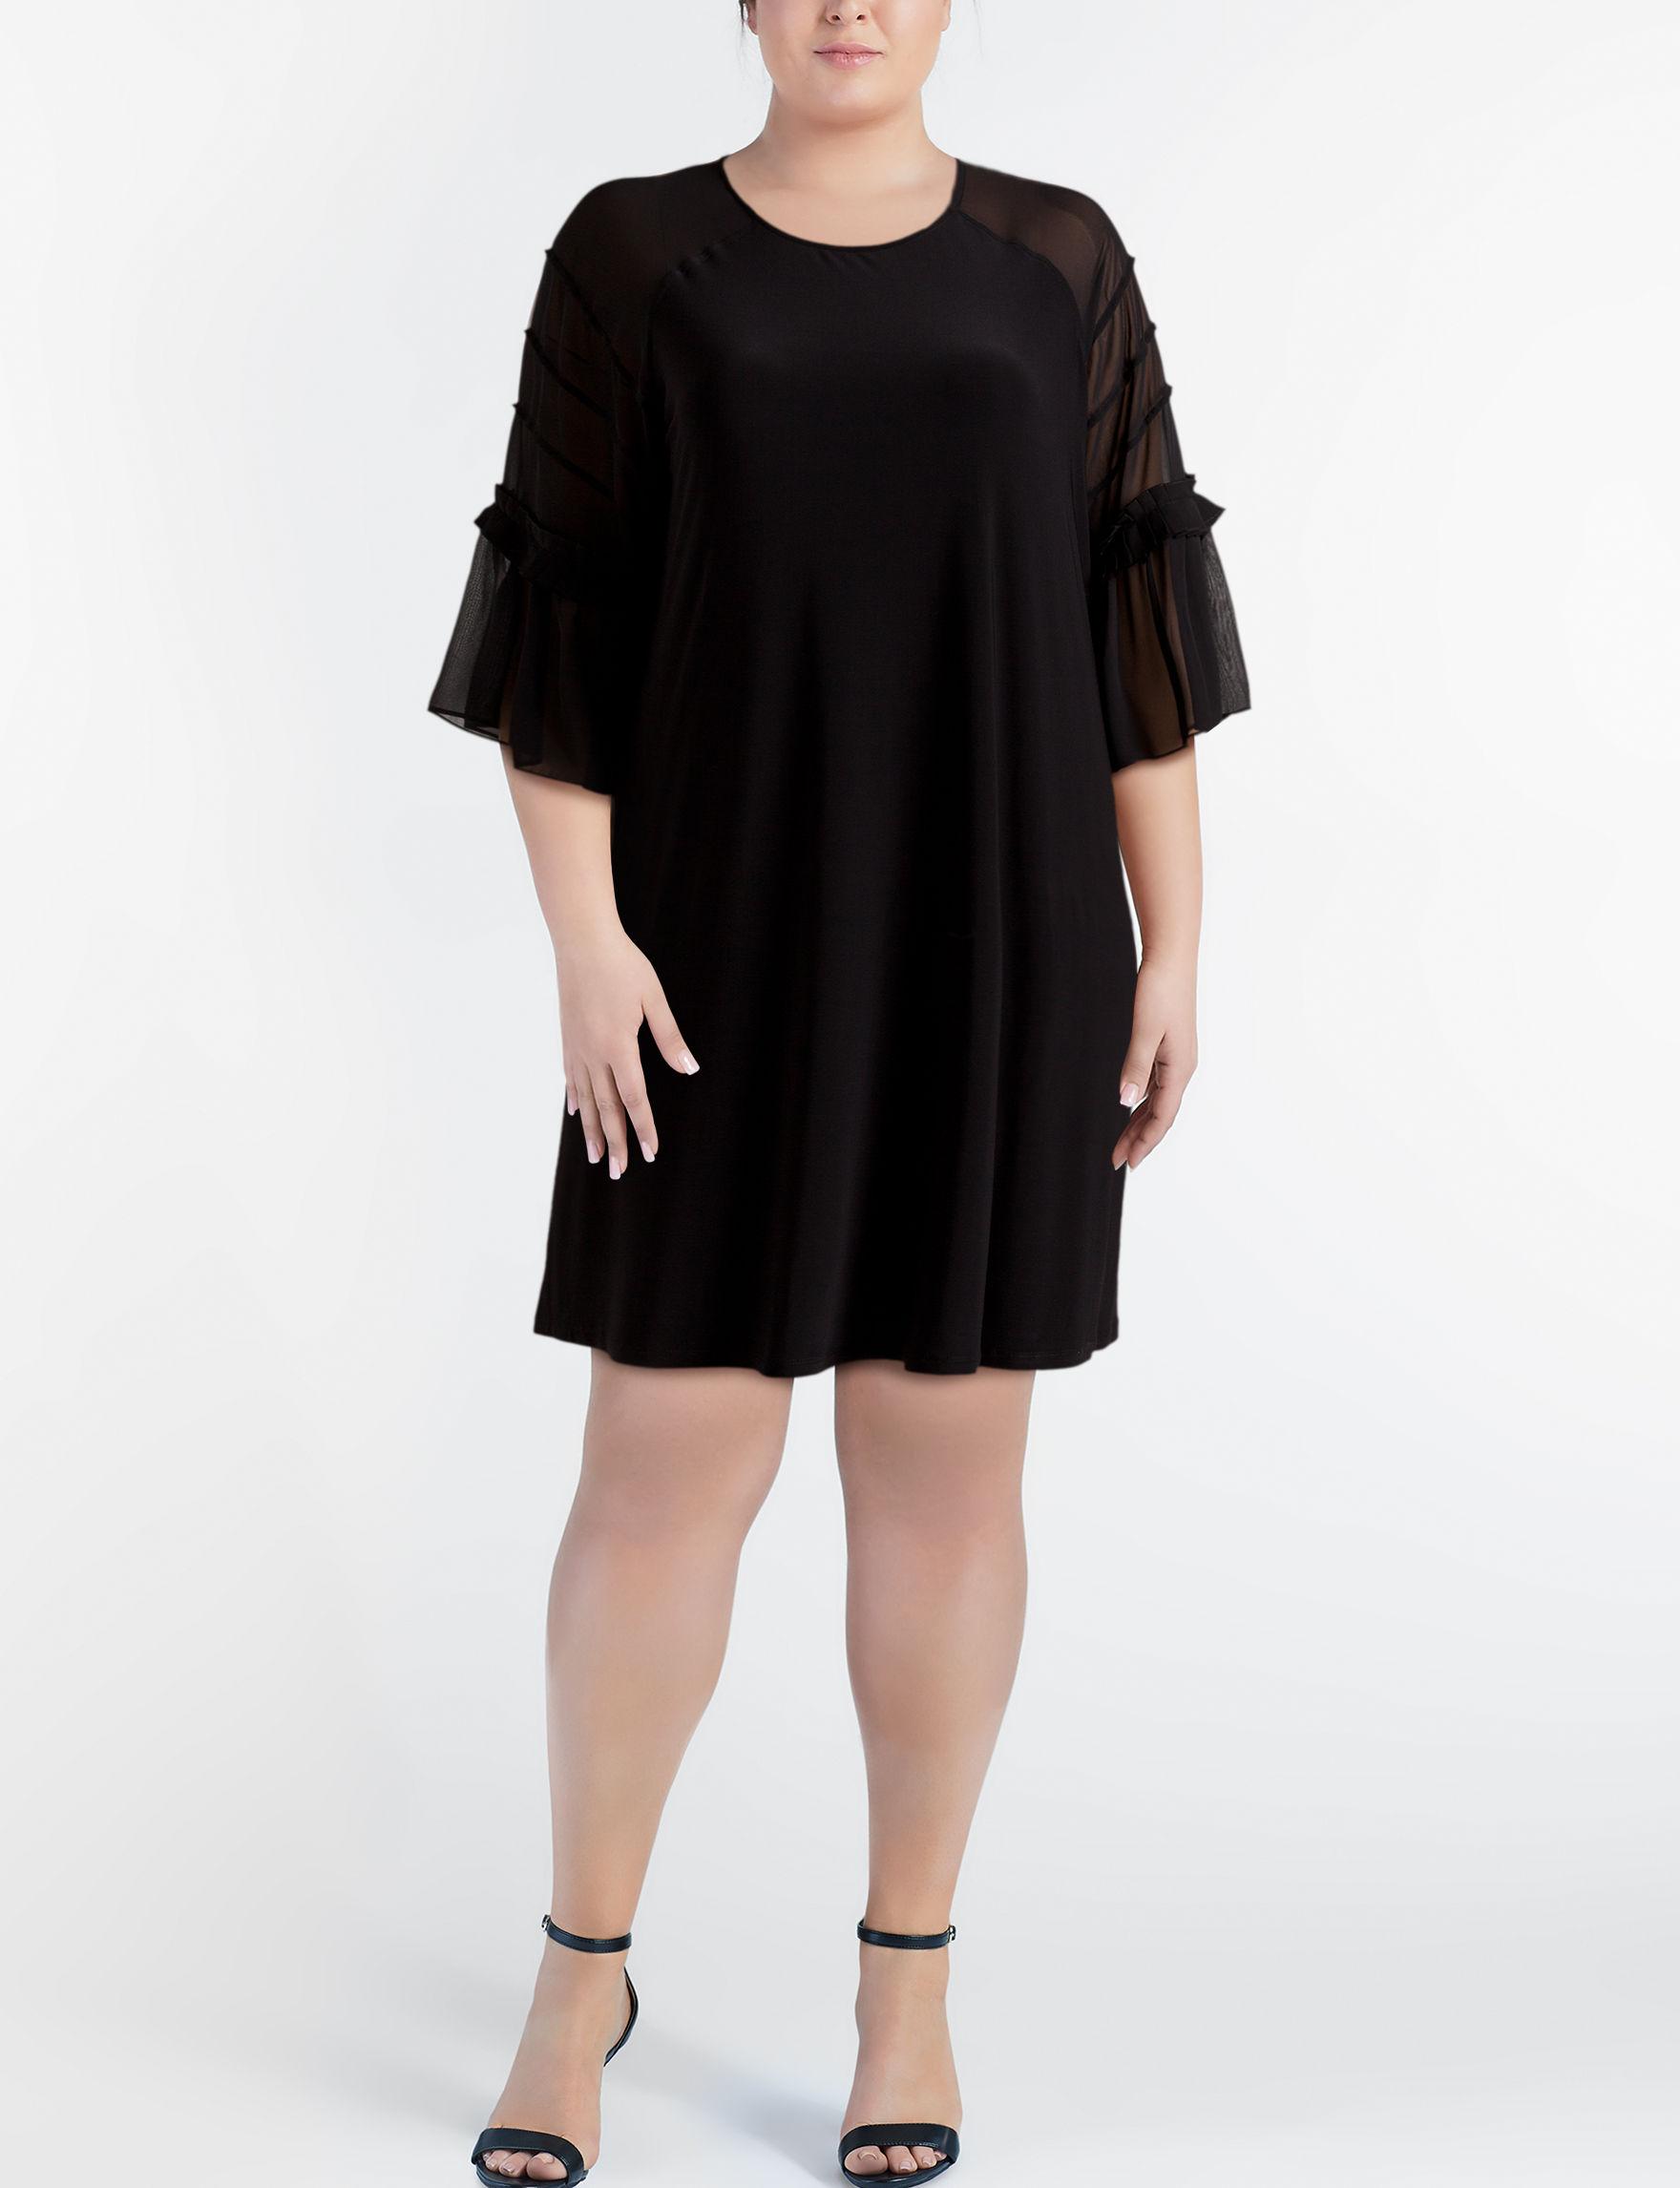 Nina Leonard Black Cocktail & Party Everyday & Casual Shift Dresses